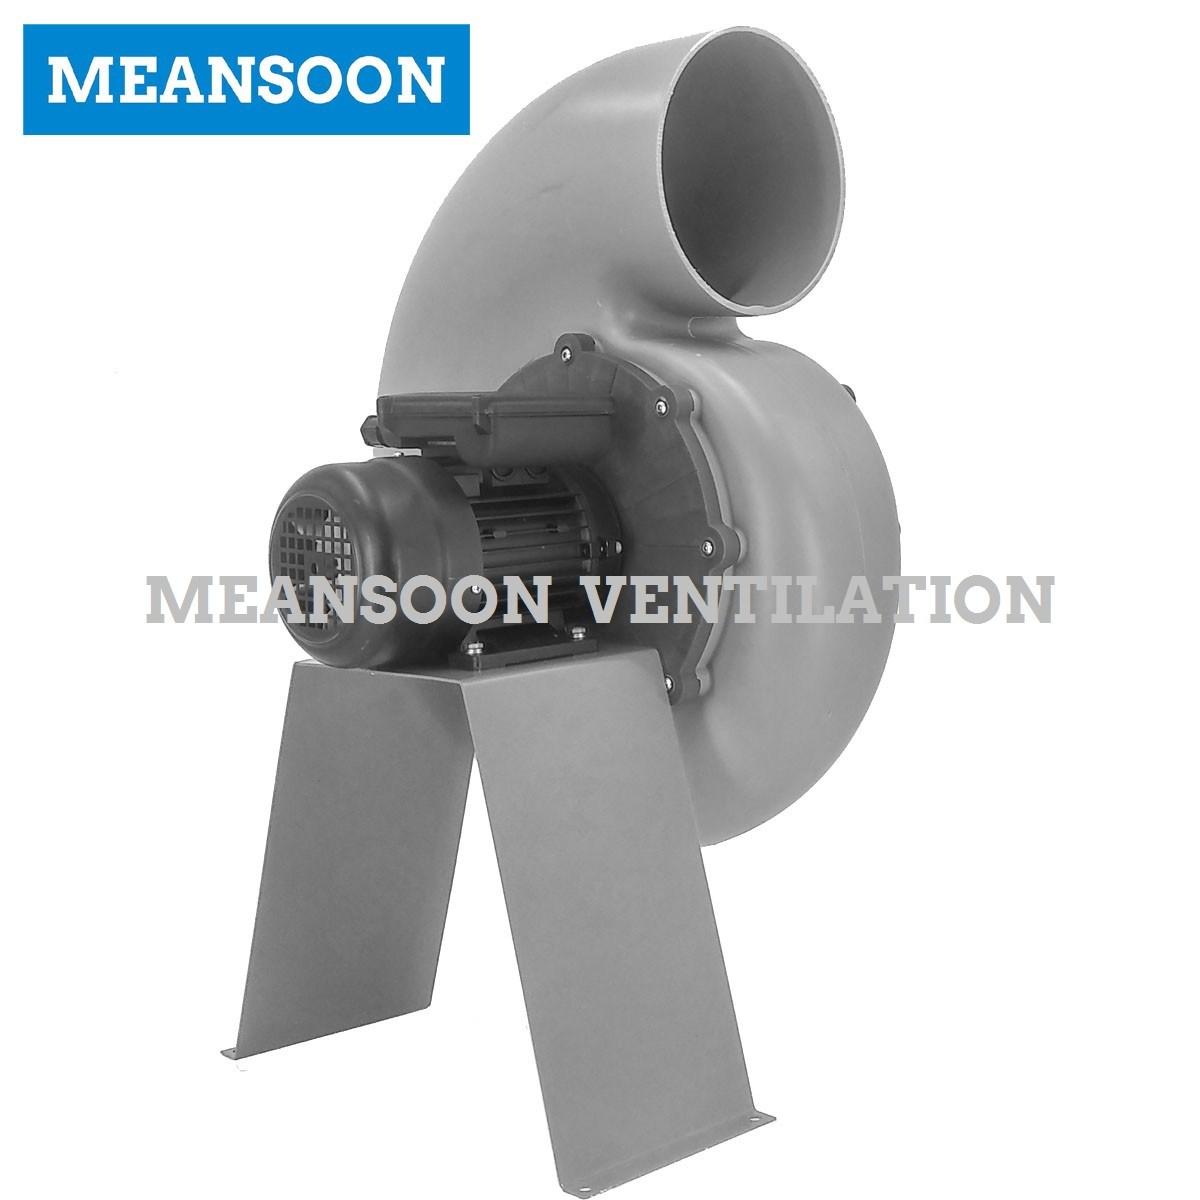 Plastic Corrosion Resistant Centrifugal Fan 200 for Laboratory Ventilation